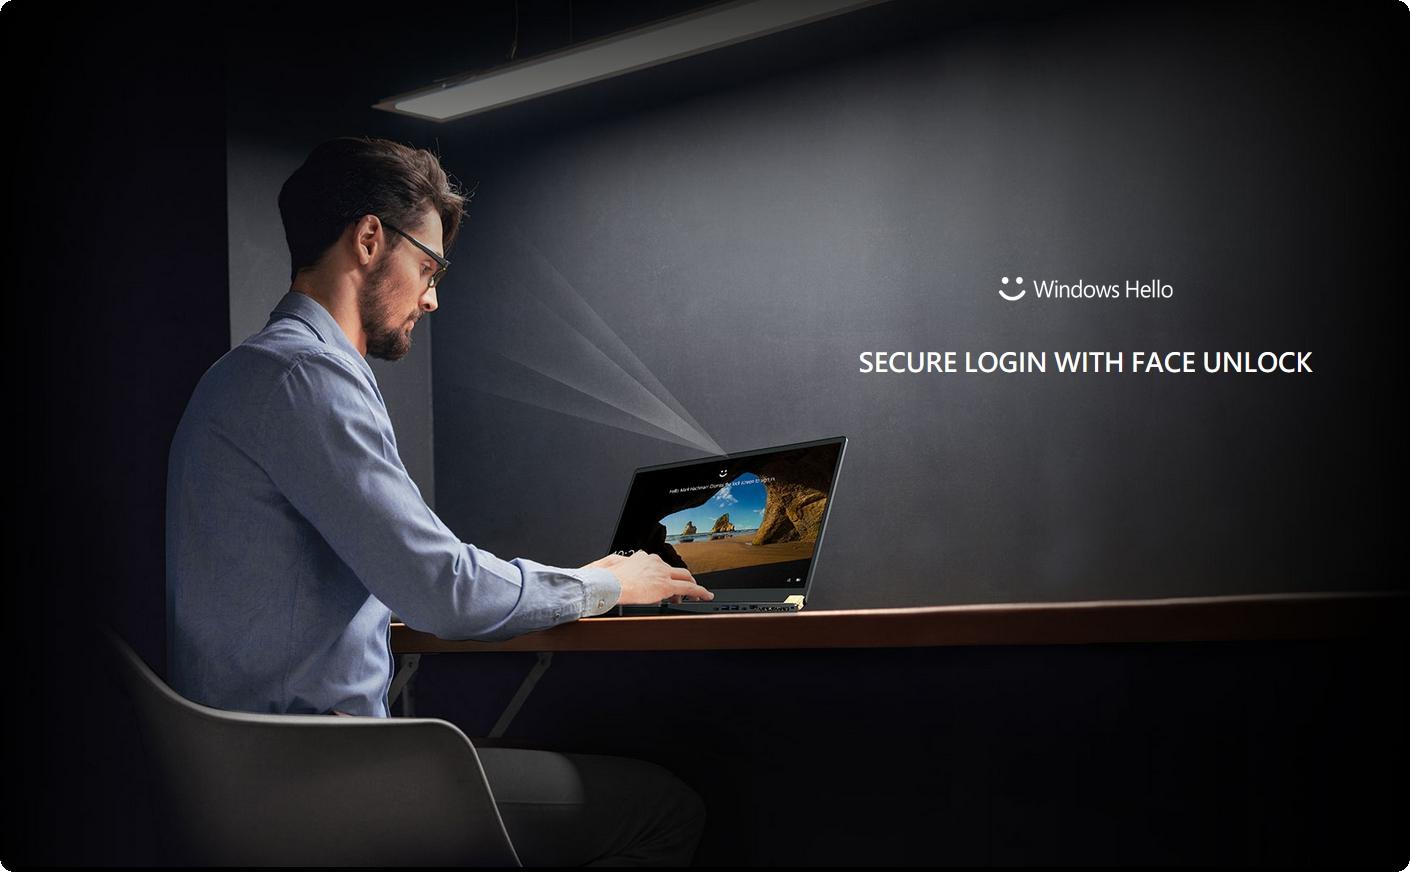 Cách bảo mật bằng Windows Hello Face